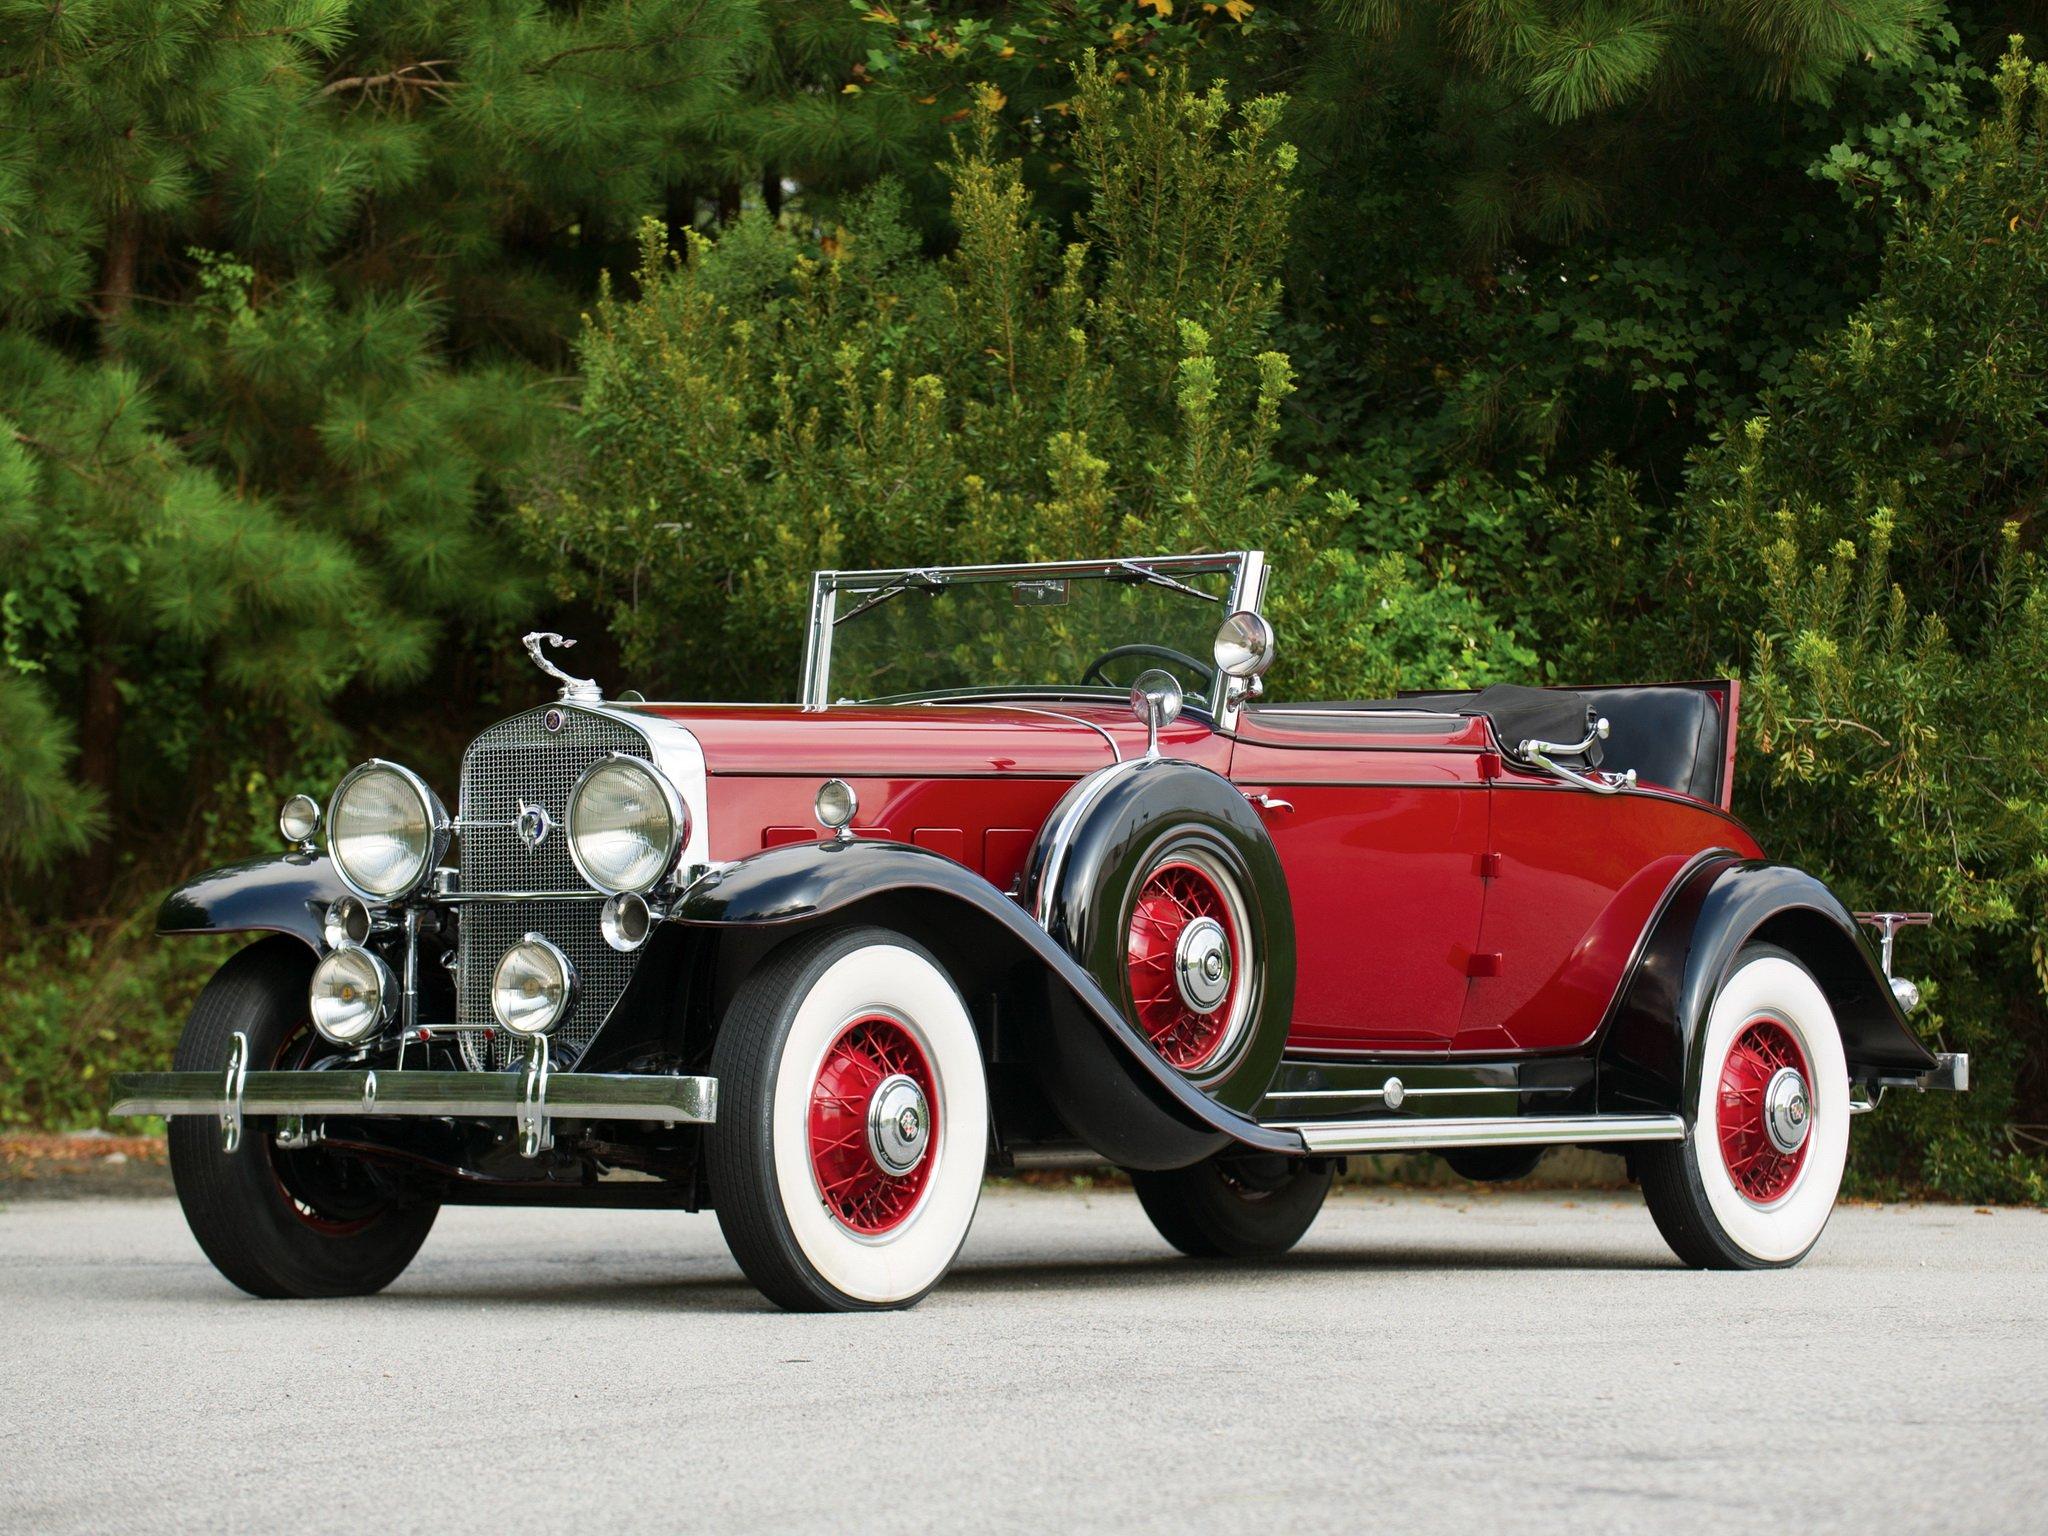 1931 cadillac 370 a v12 convertible coupe fleetwood 4735. Black Bedroom Furniture Sets. Home Design Ideas